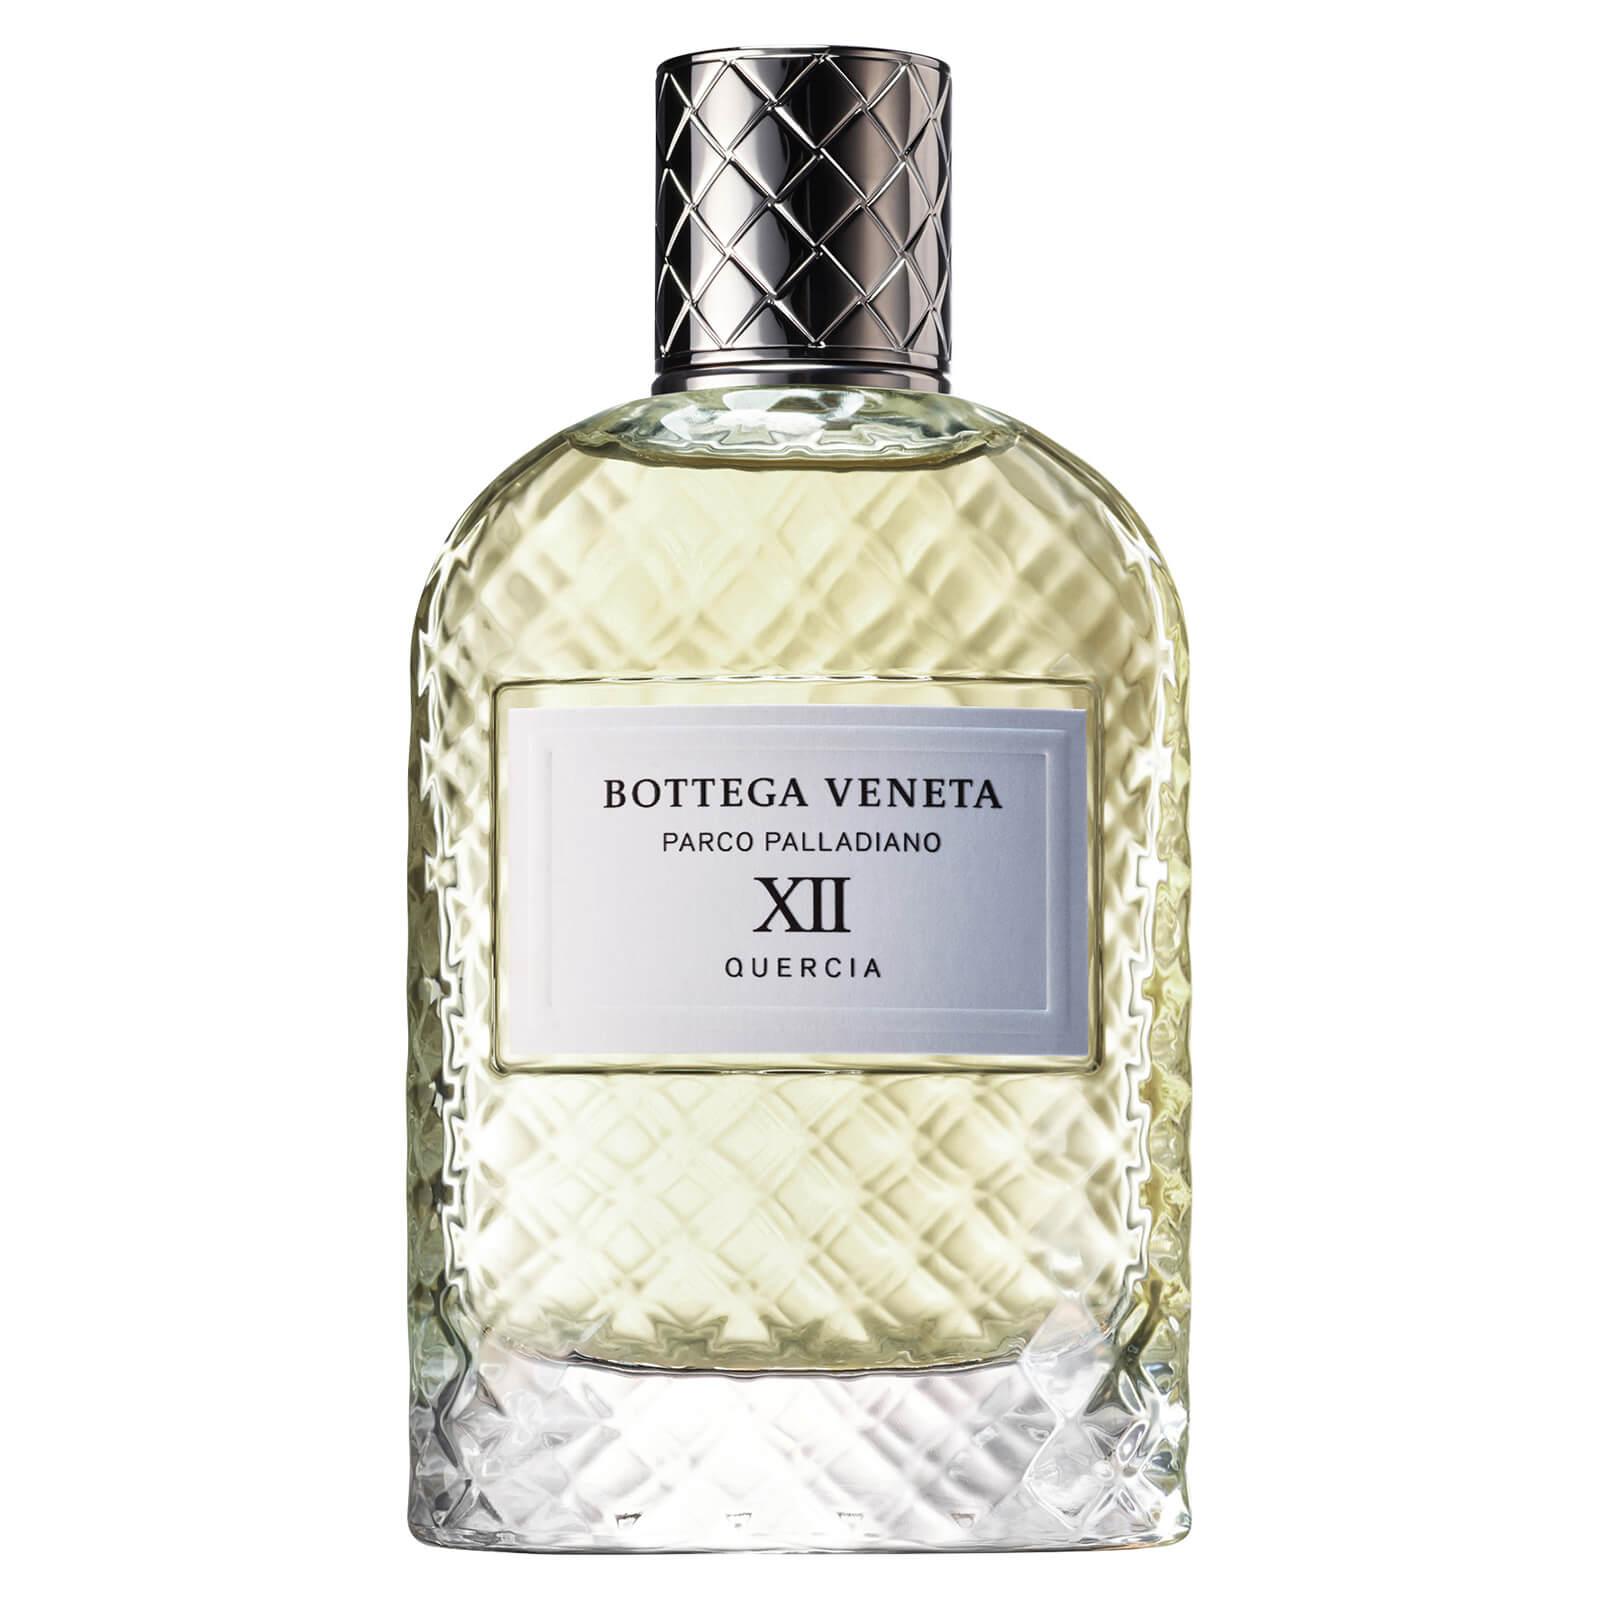 Bottega Veneta Parco Palladiano XII - Quercia Eau de Parfum 100ml